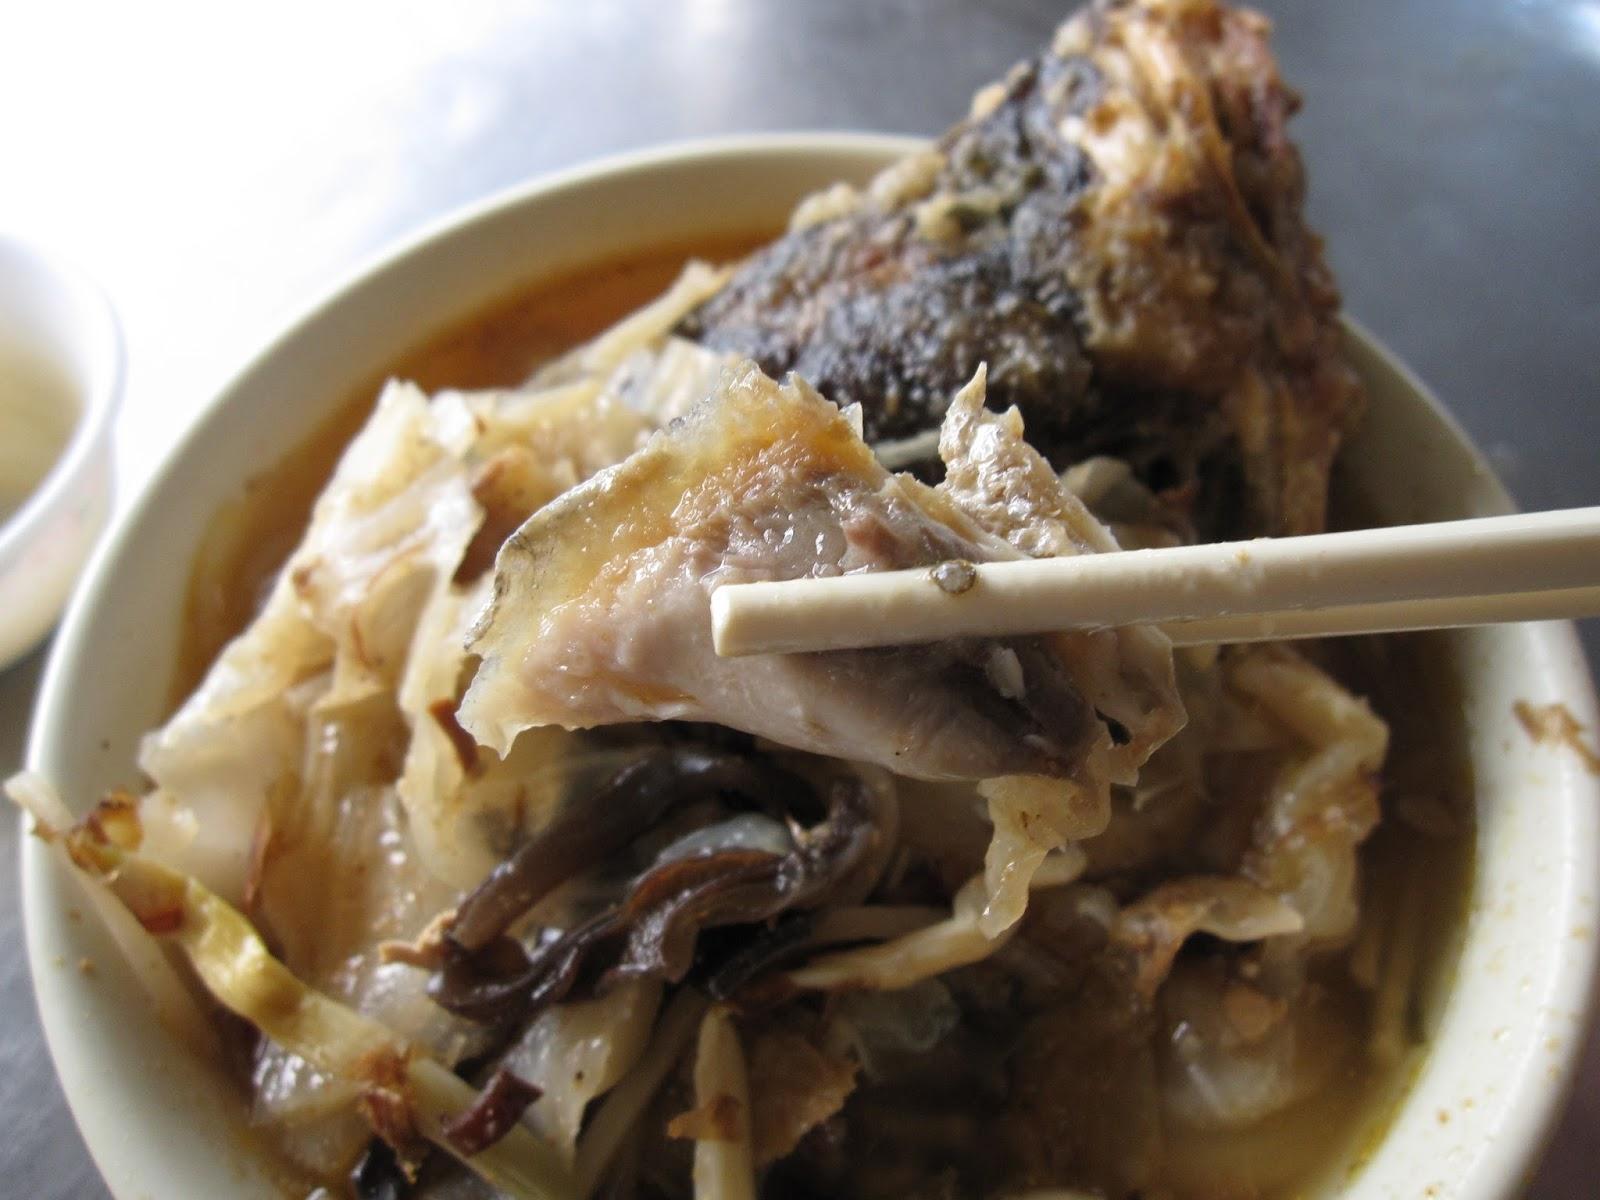 popopig eat everywhere: 臺南 太子路砂鍋魚頭